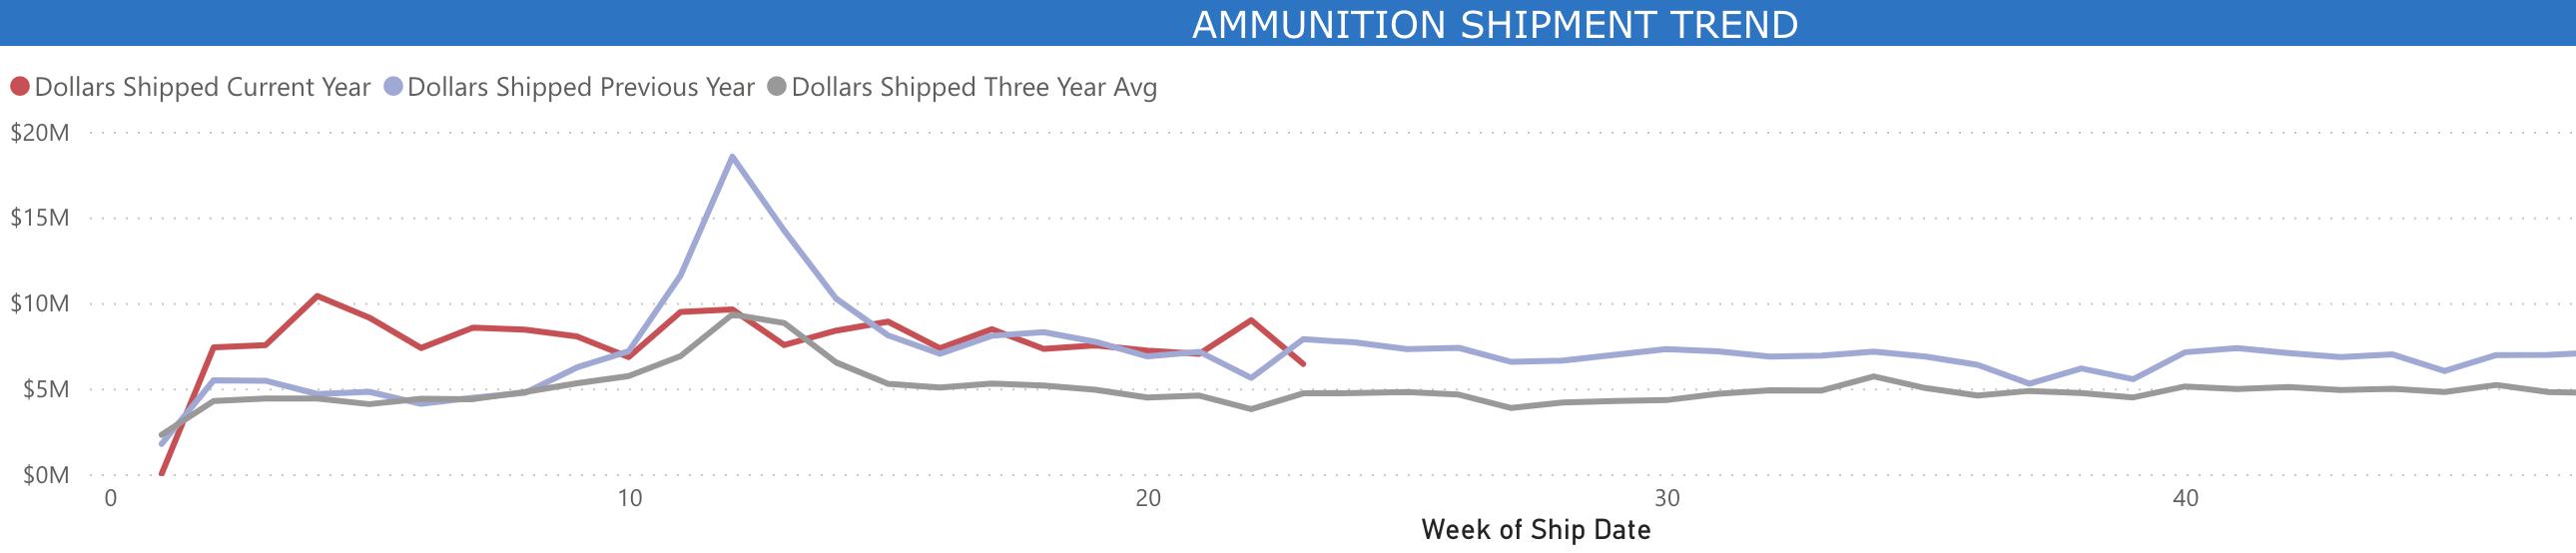 Ammunition Chat